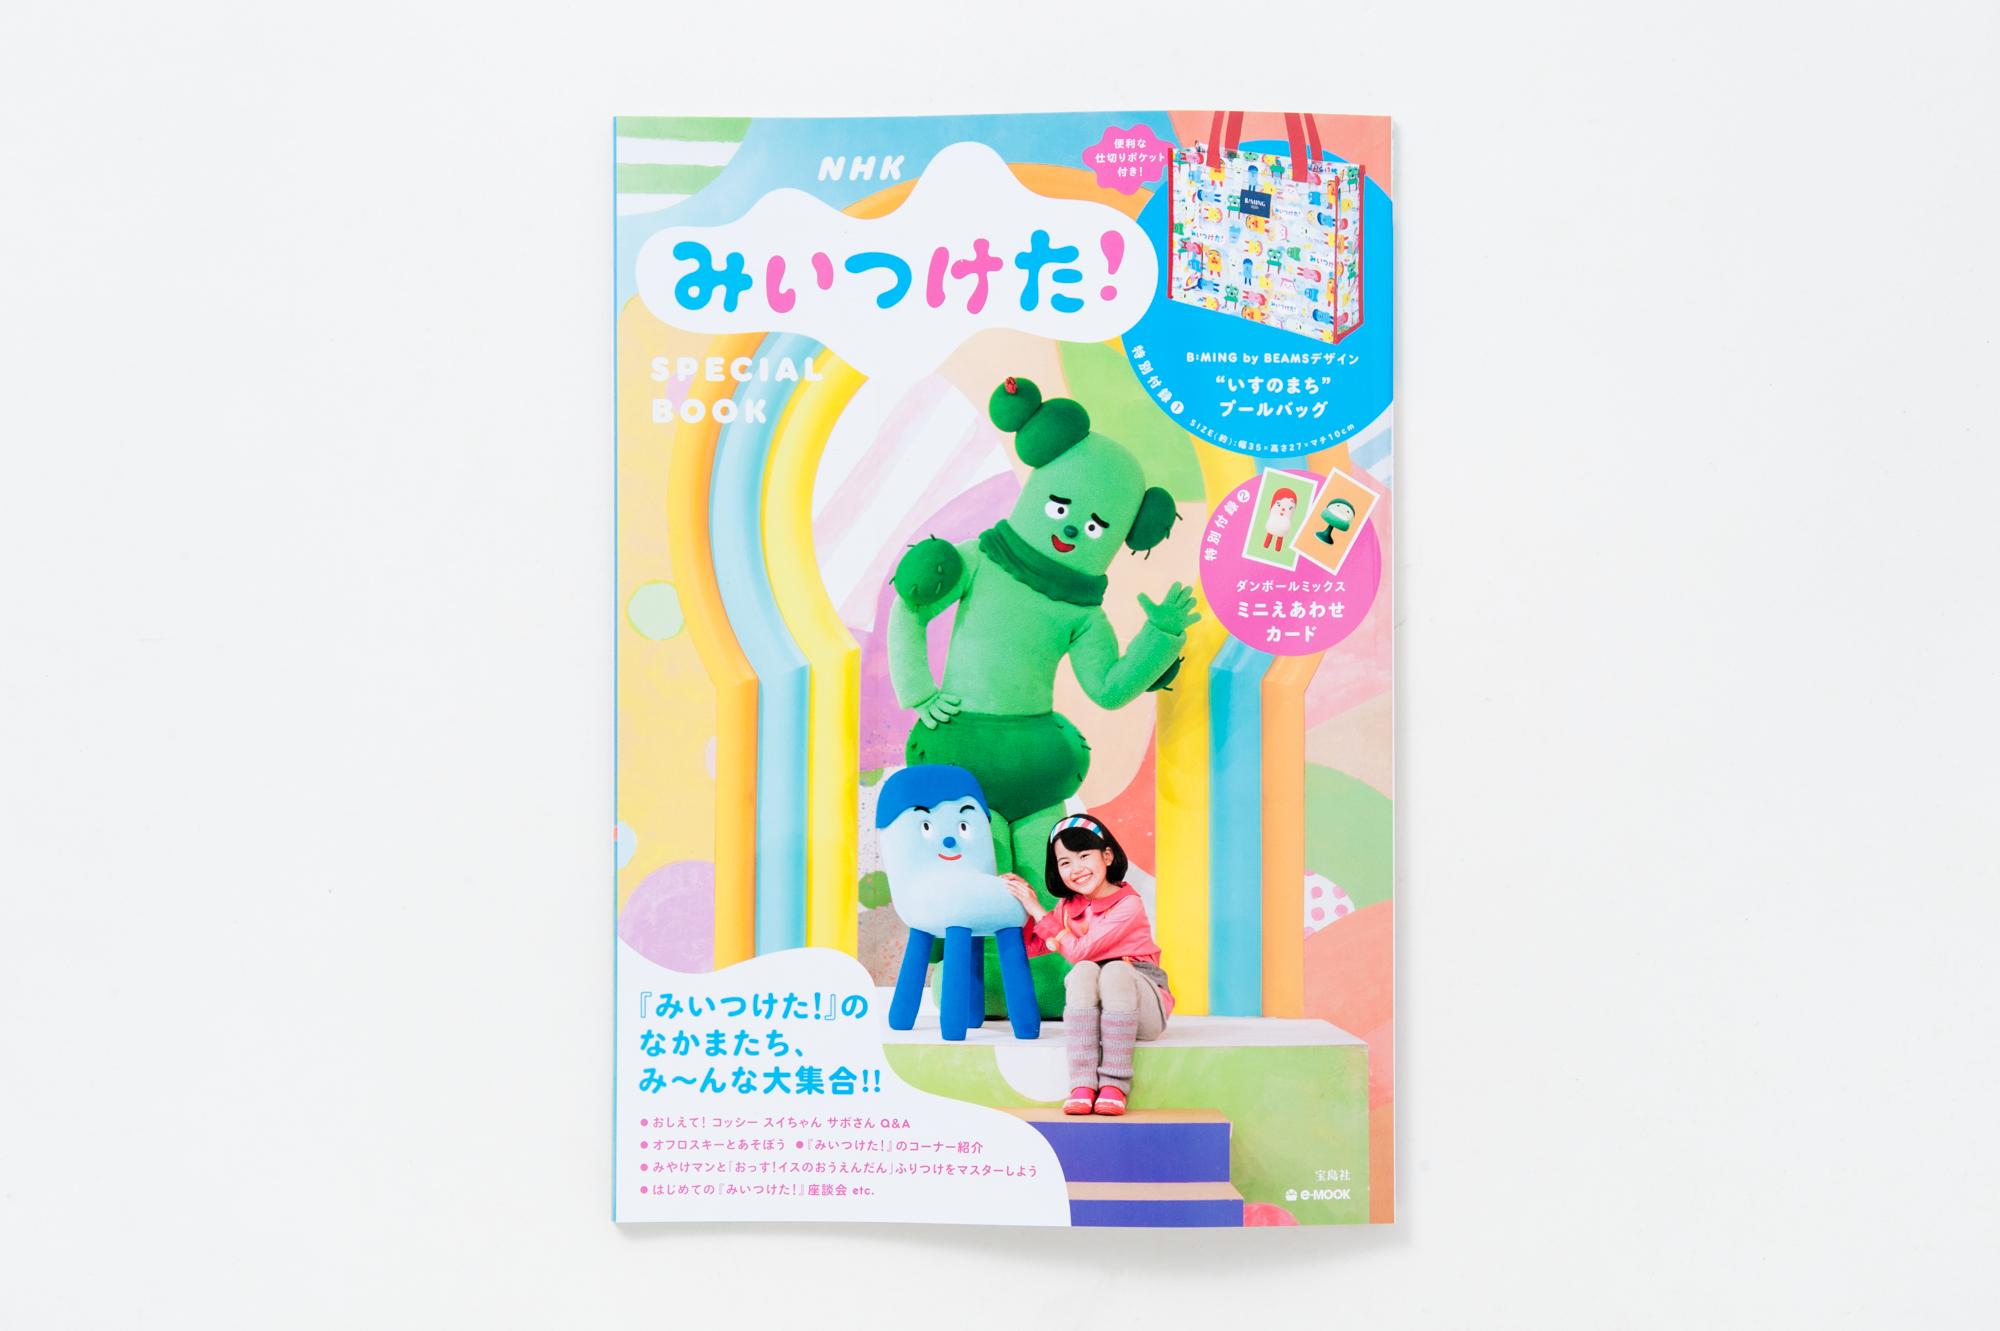 NHK「みいつけた!」SPECIAL BOOK 2017 photo:Masanori Ikeda